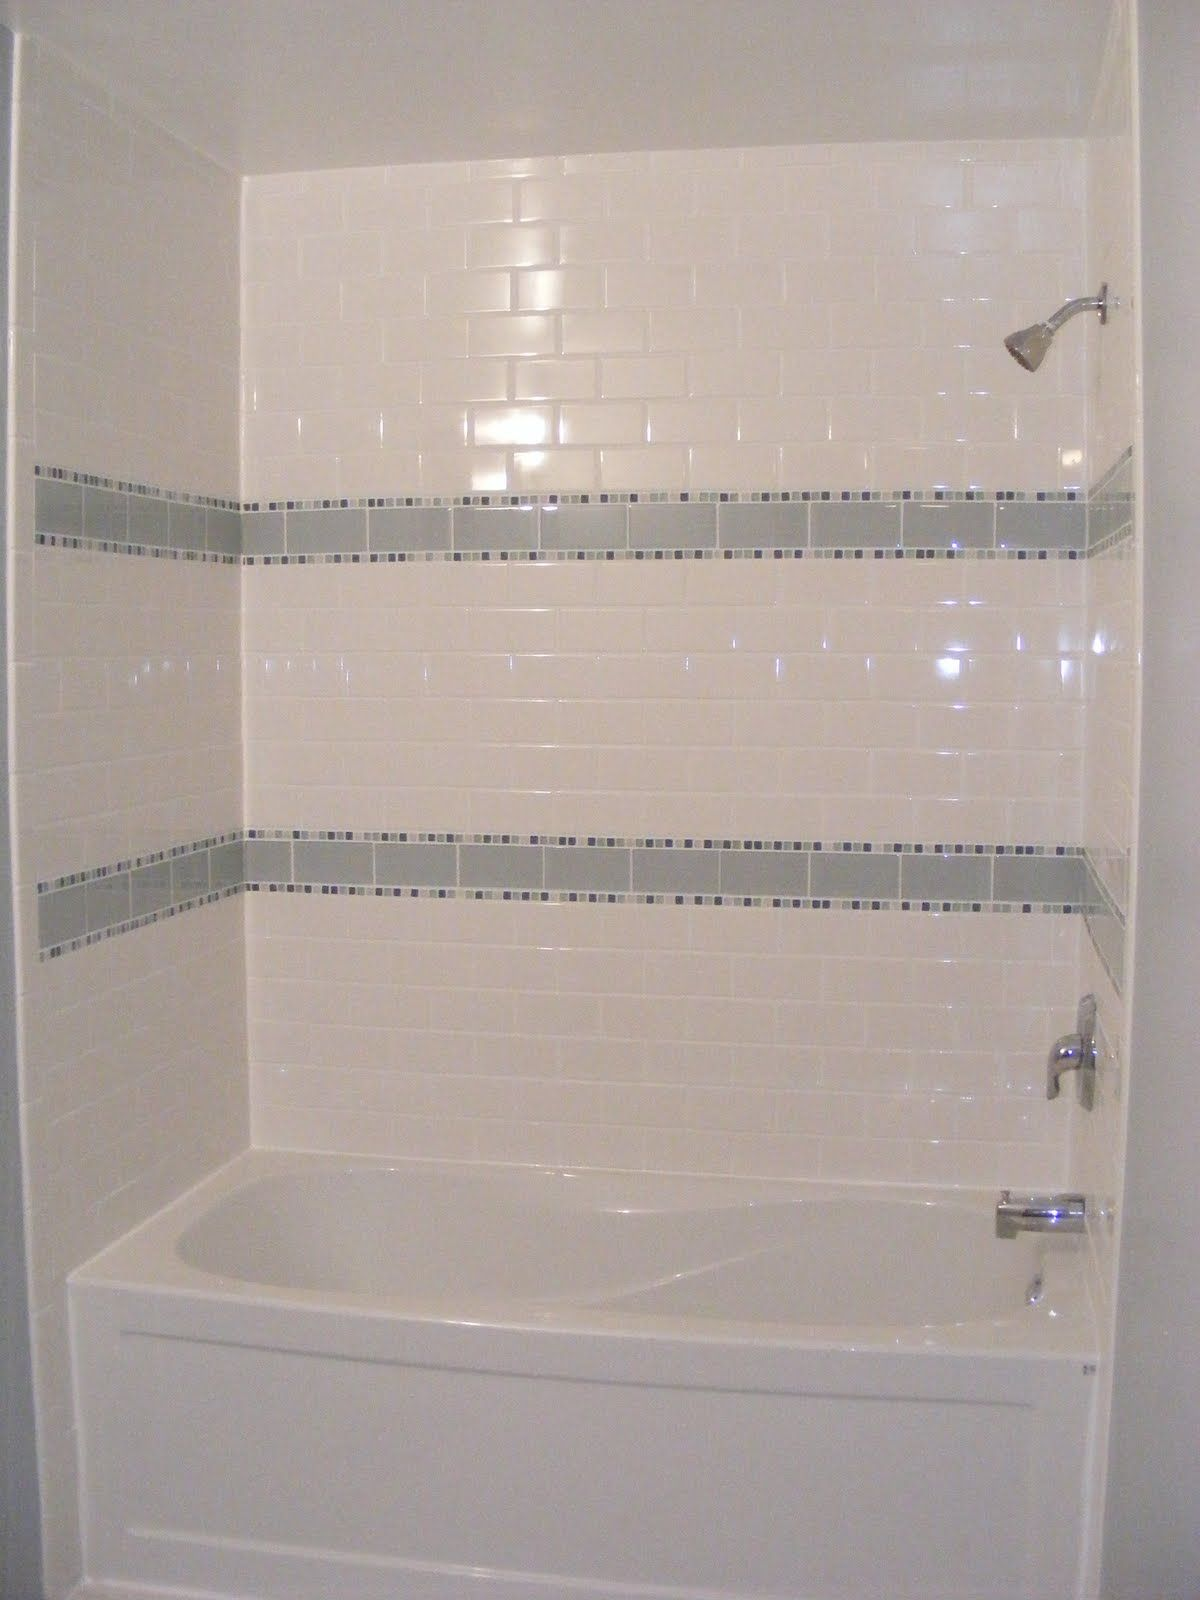 guest bathroom tile ideas. Bathroom Amusing Bath Tile Ideas Beautiful Gloss White Wall Subway Shower Bathtub With Gray Striped Ceramic Decor In Small Guest